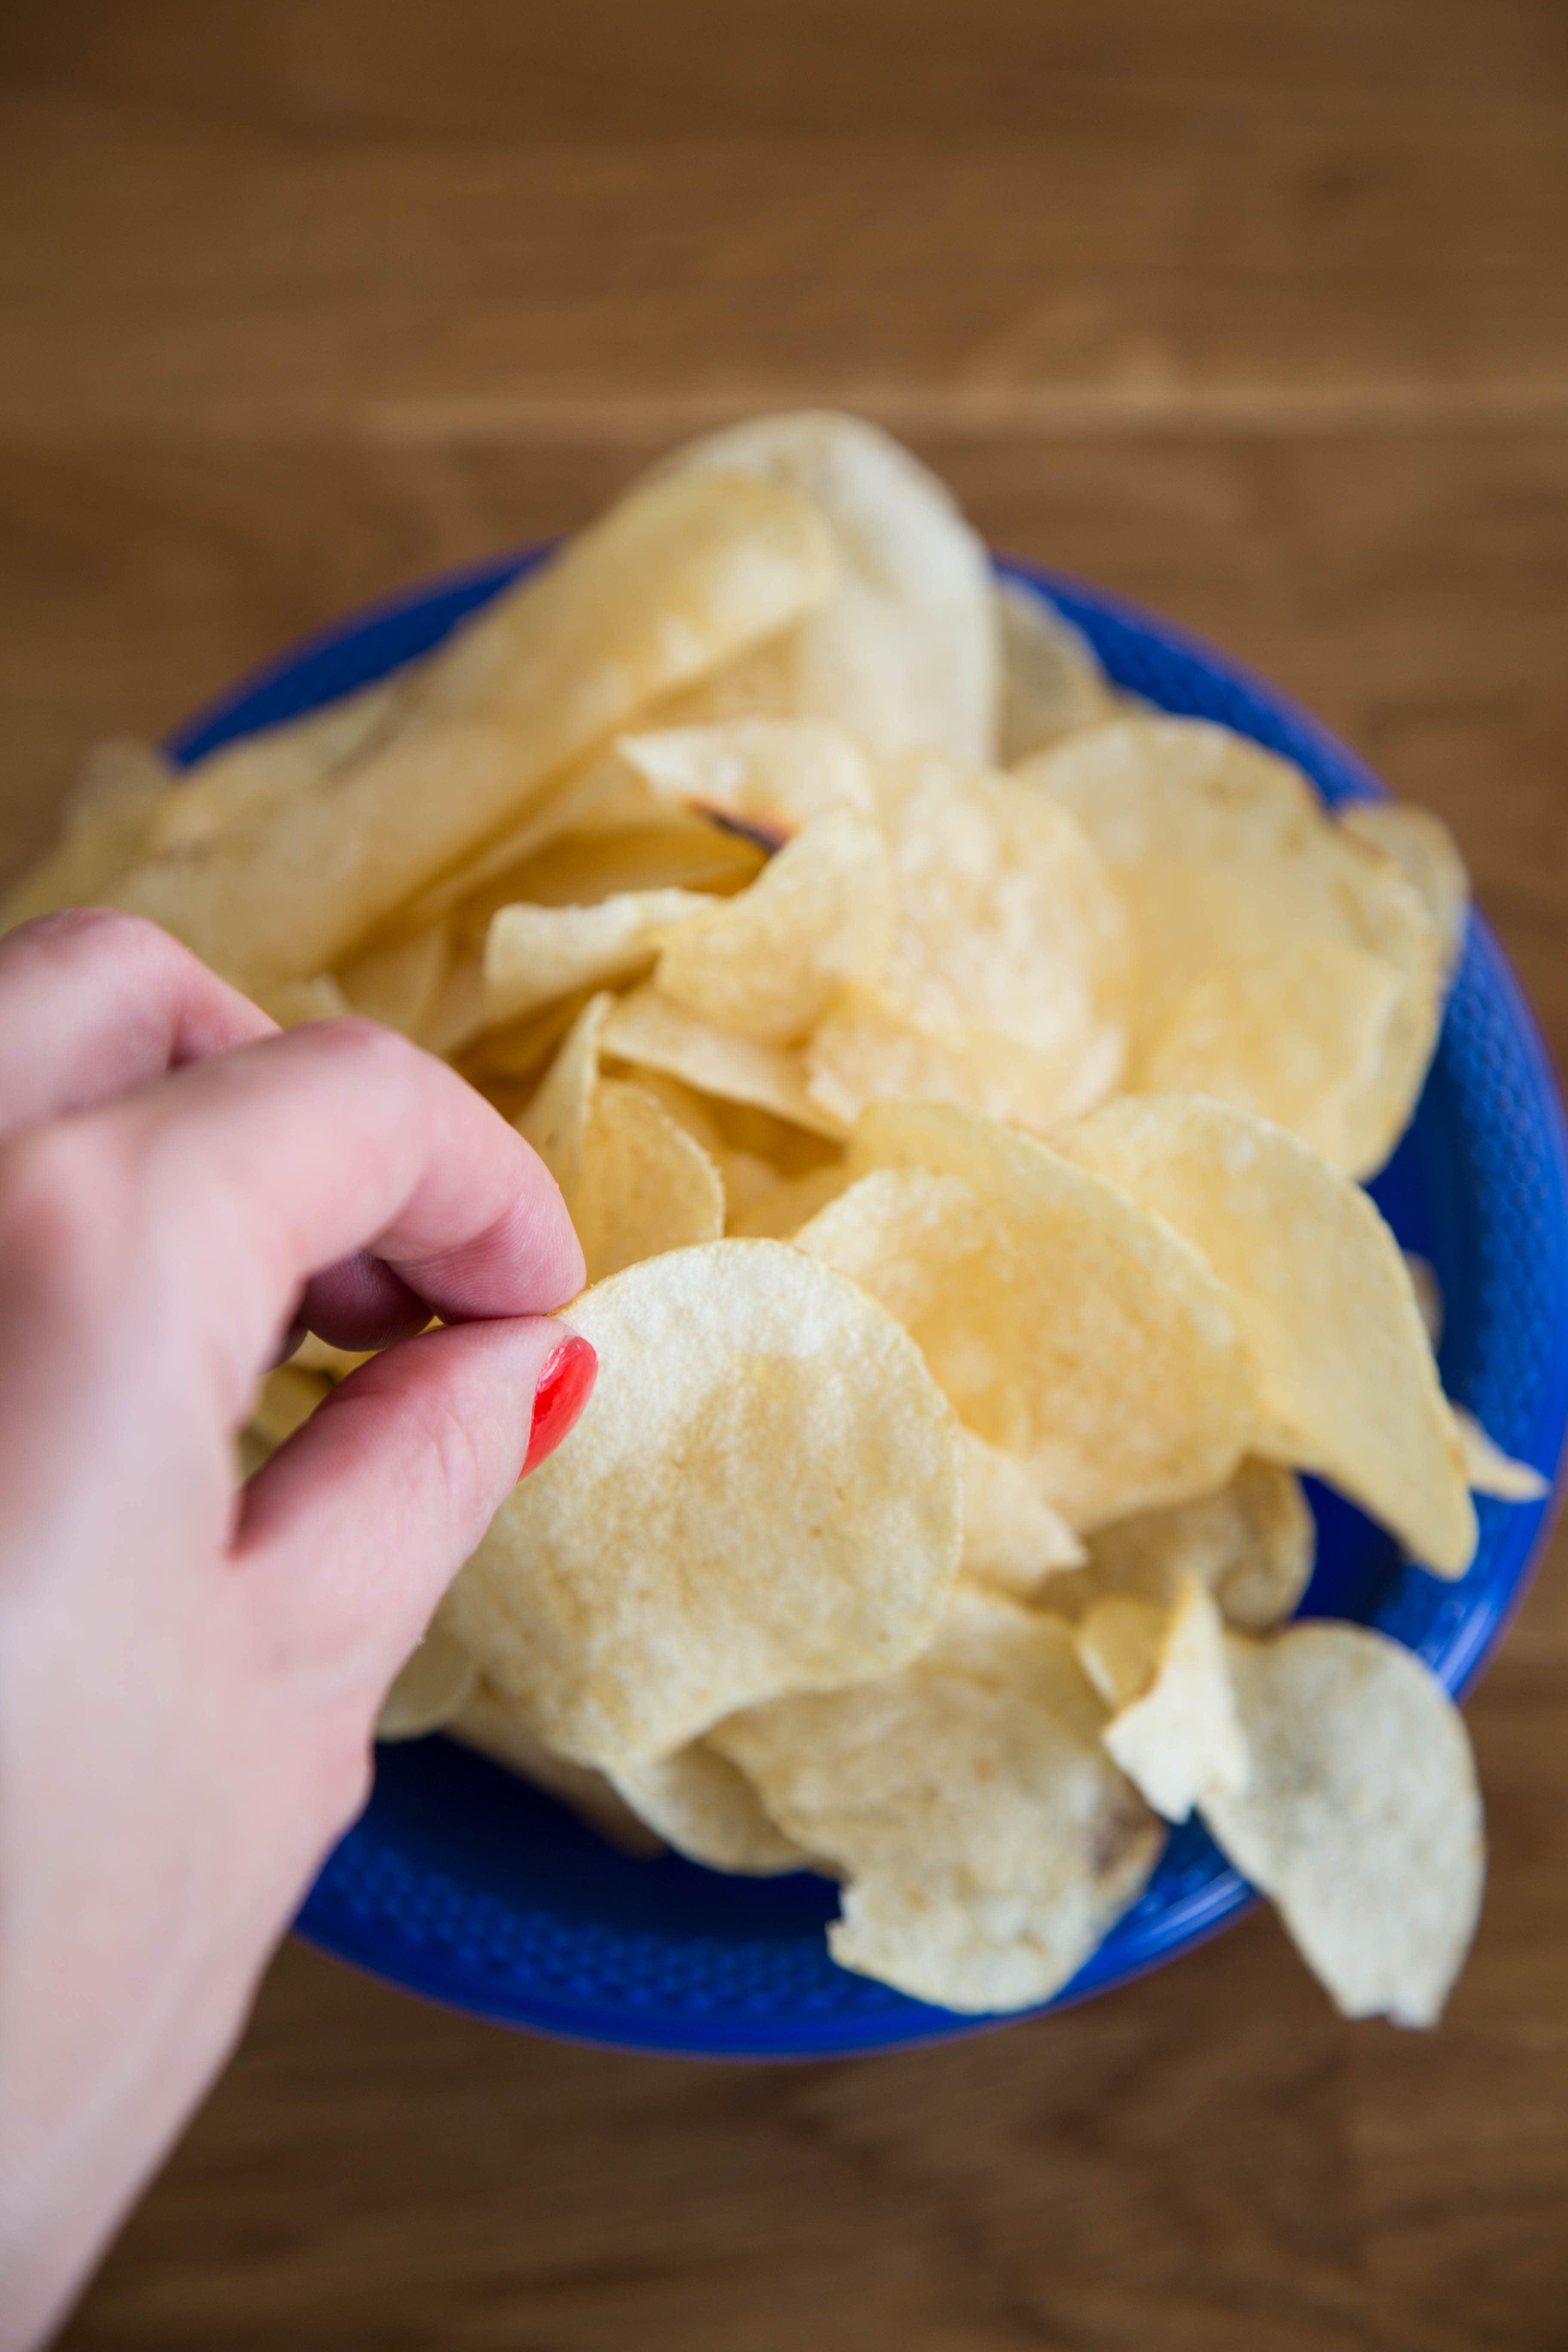 Potato Chip Taste Test